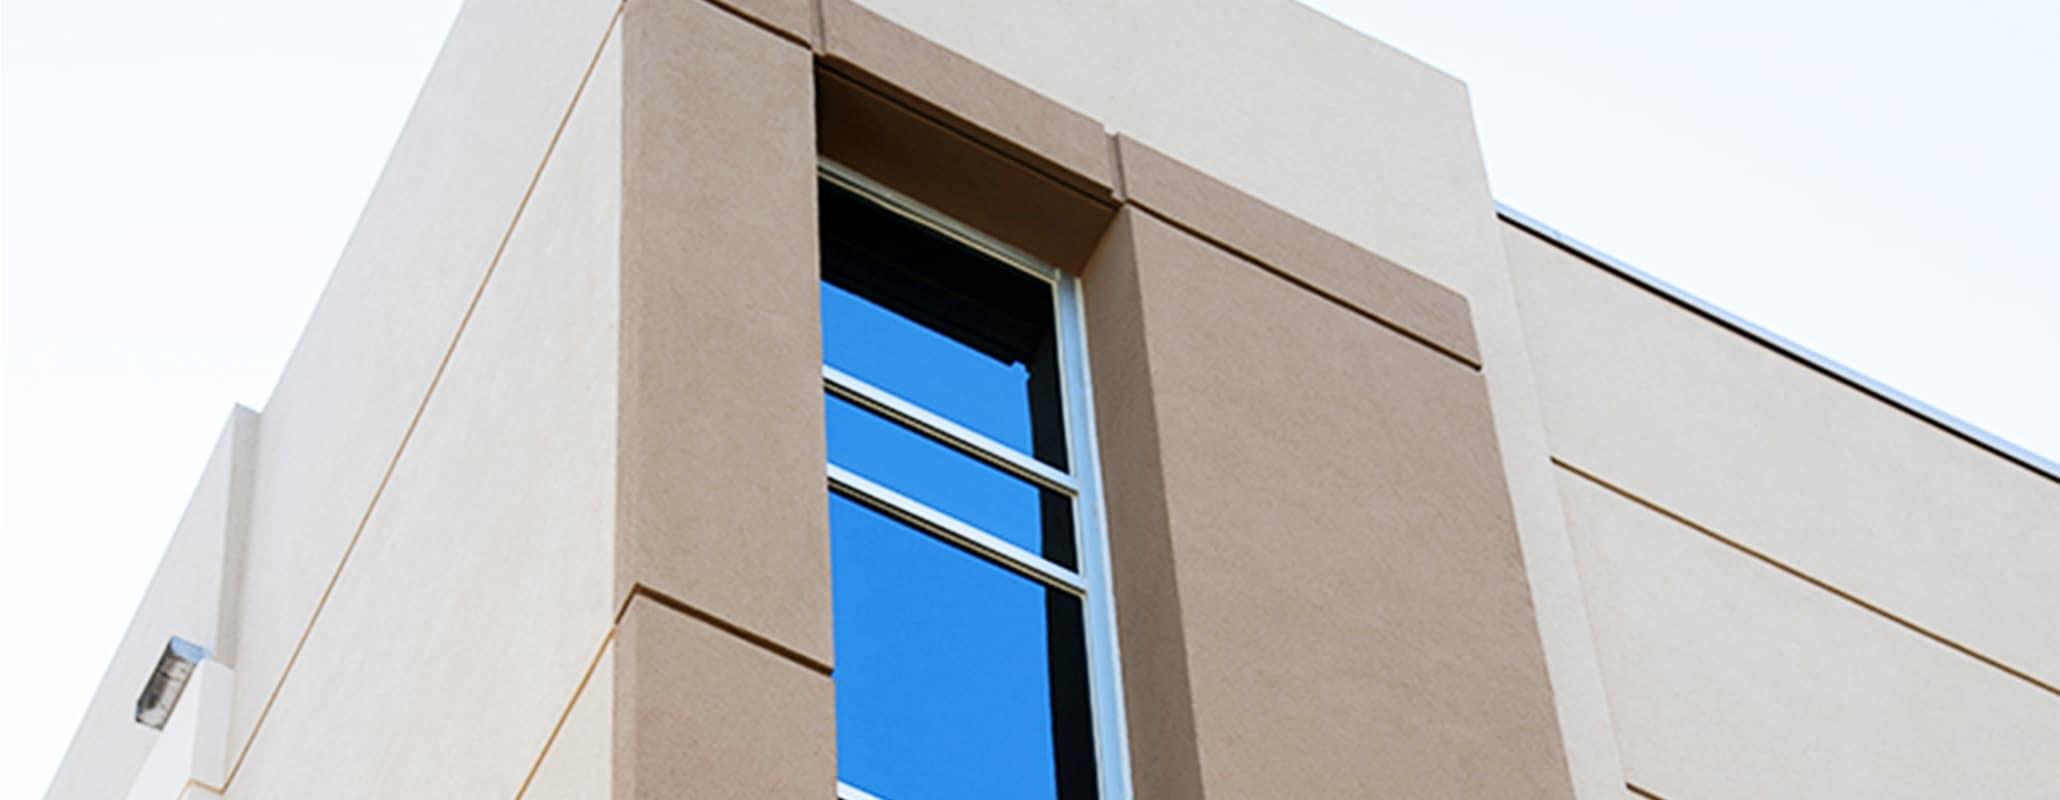 Aldora SMI-090 windows run down the corner of a commercial cement building